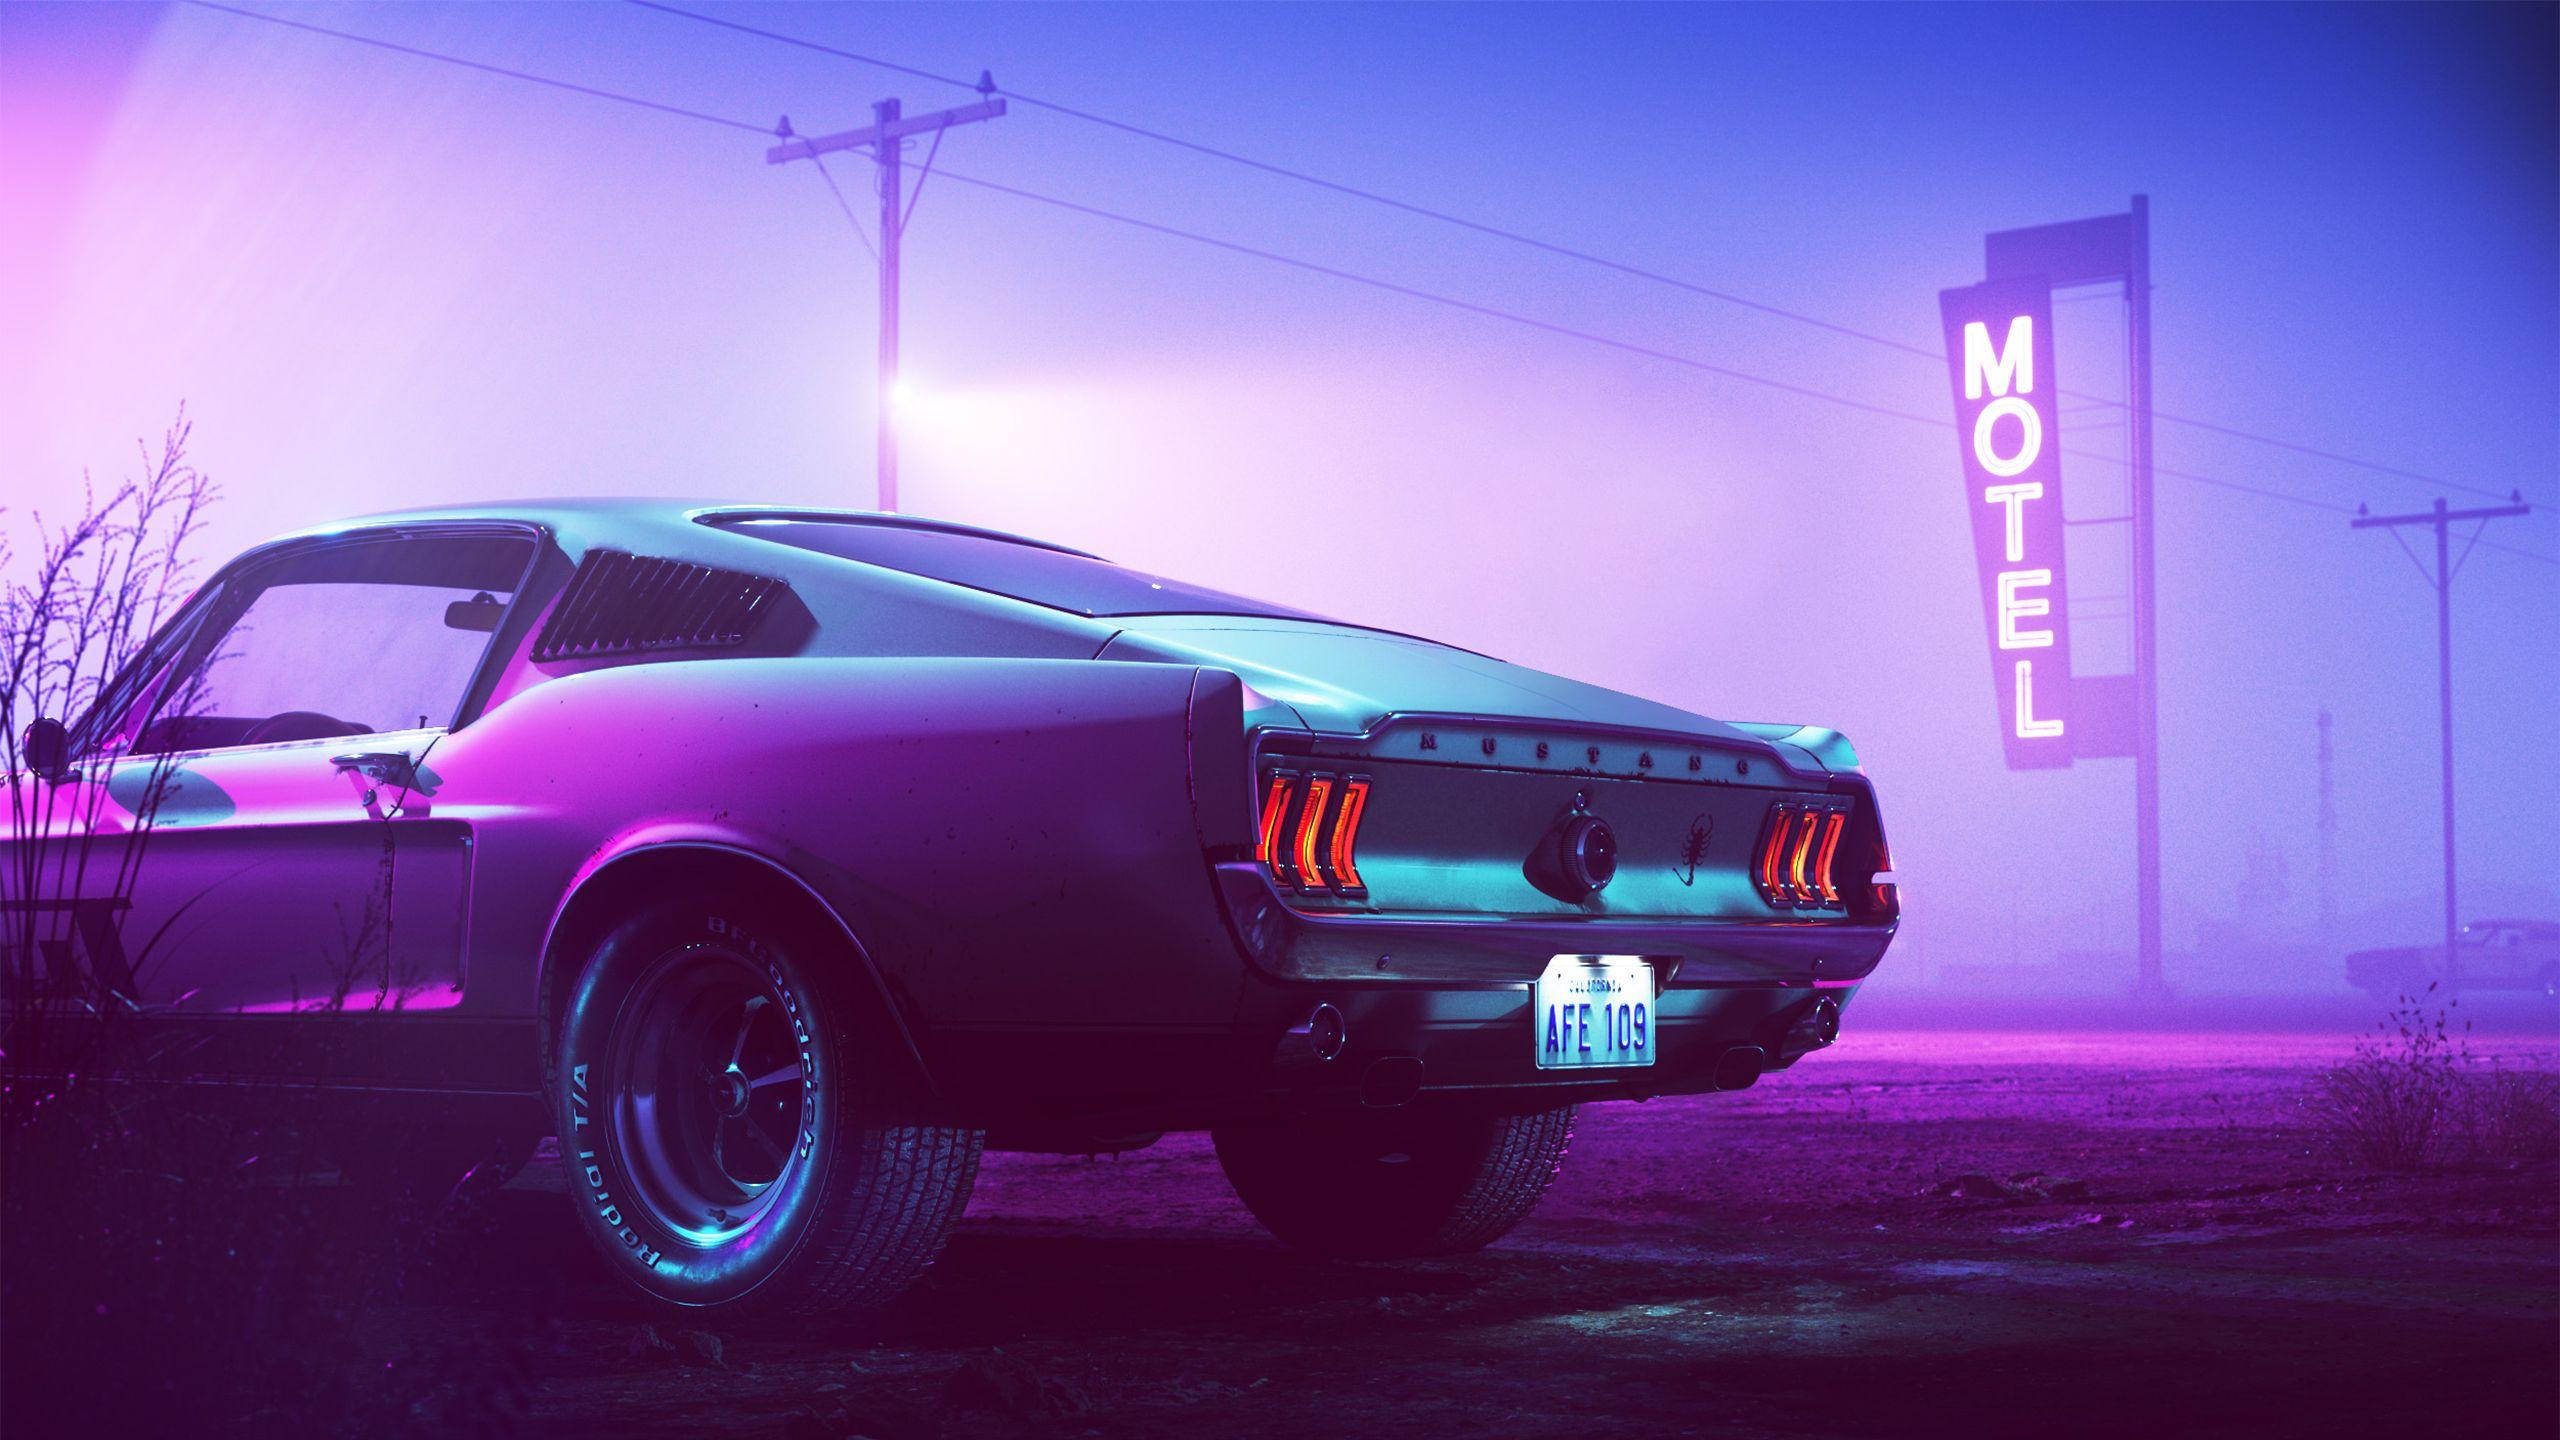 Neon Mustang Neon Car Mustang Fastback Retro Waves